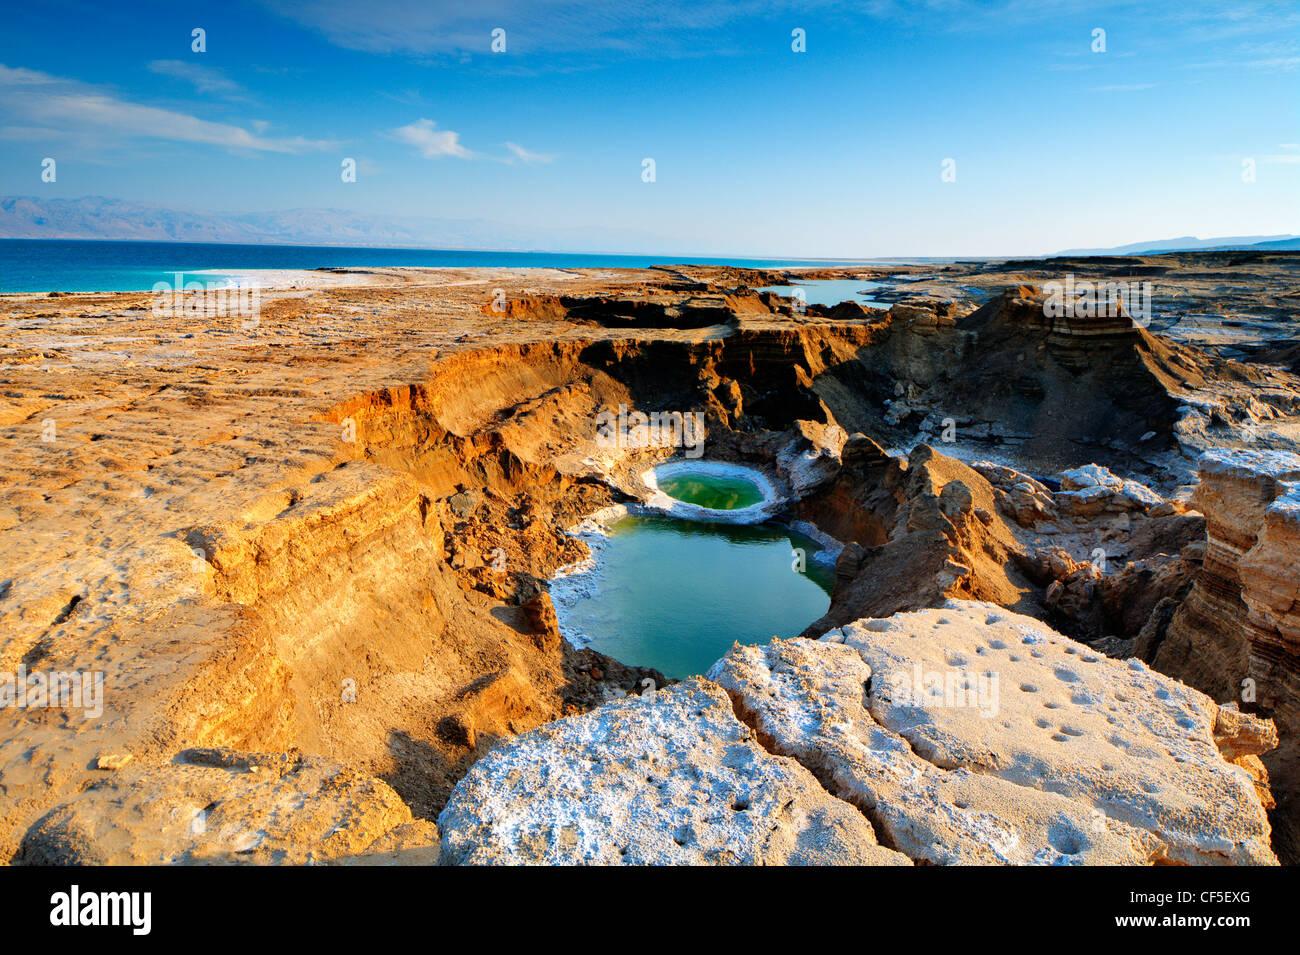 Sink Holes cerca del Mar Muerto en Ein Gedi, Israel. Imagen De Stock